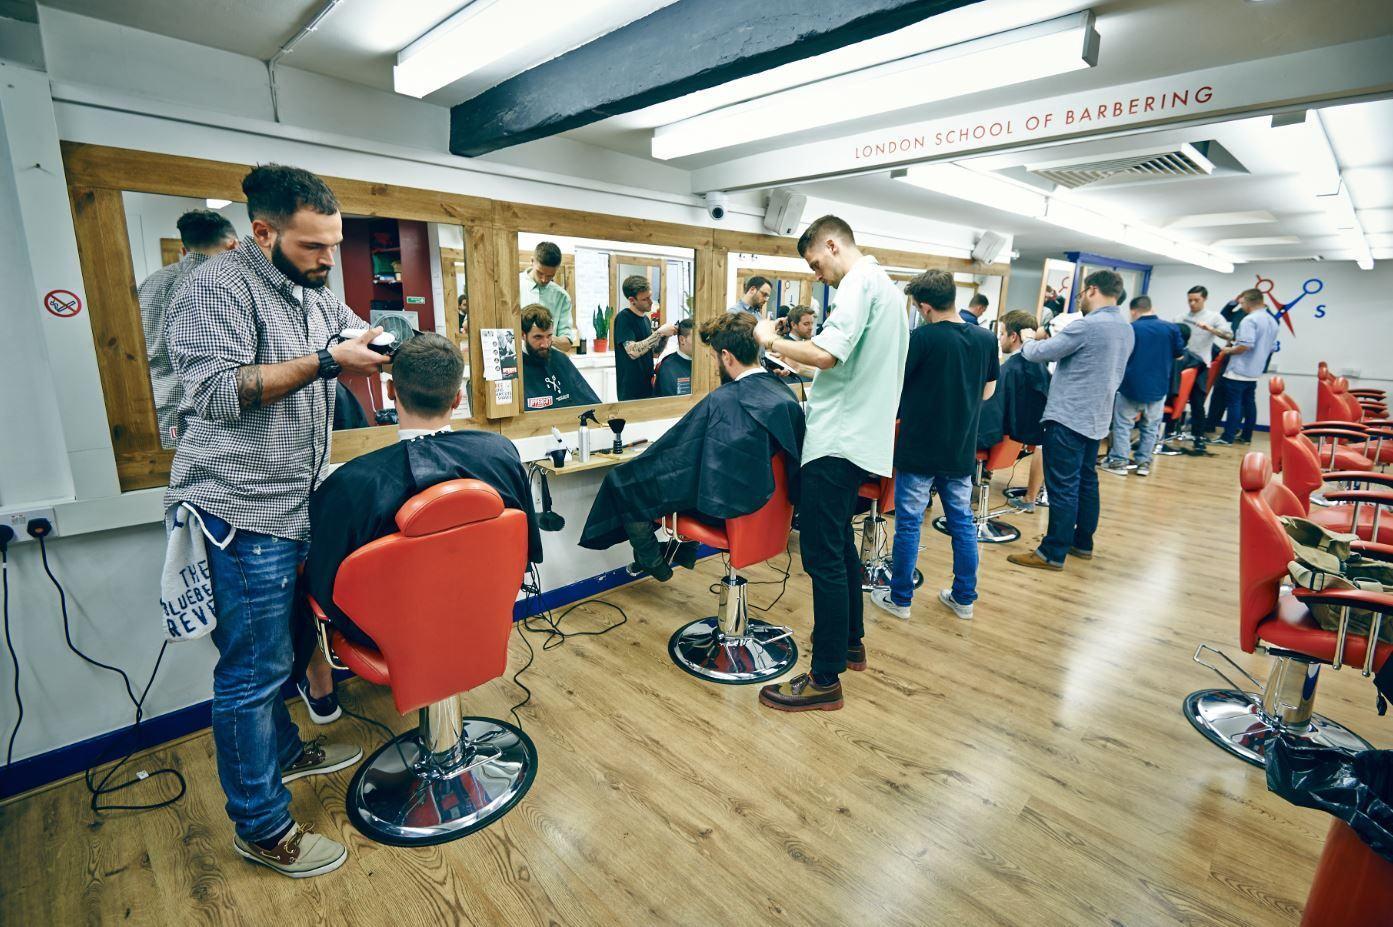 Barber Classes : London School of Barbering Free Haircuts - BrokeinLondon